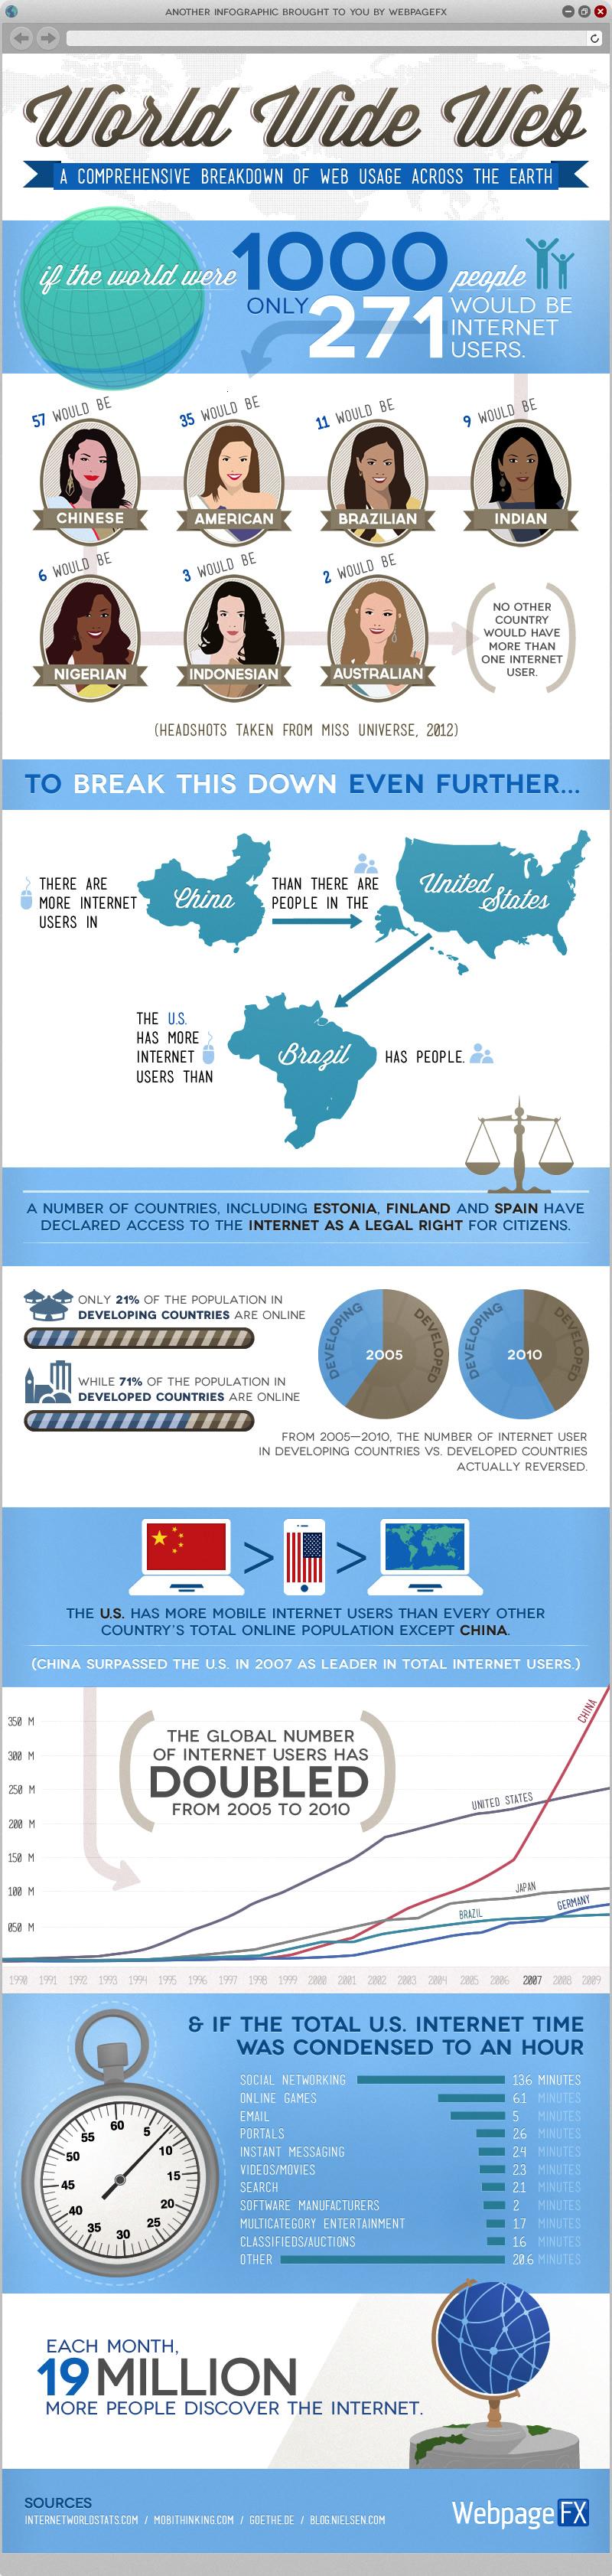 internet-usage-worldwide_5048cdb554c93